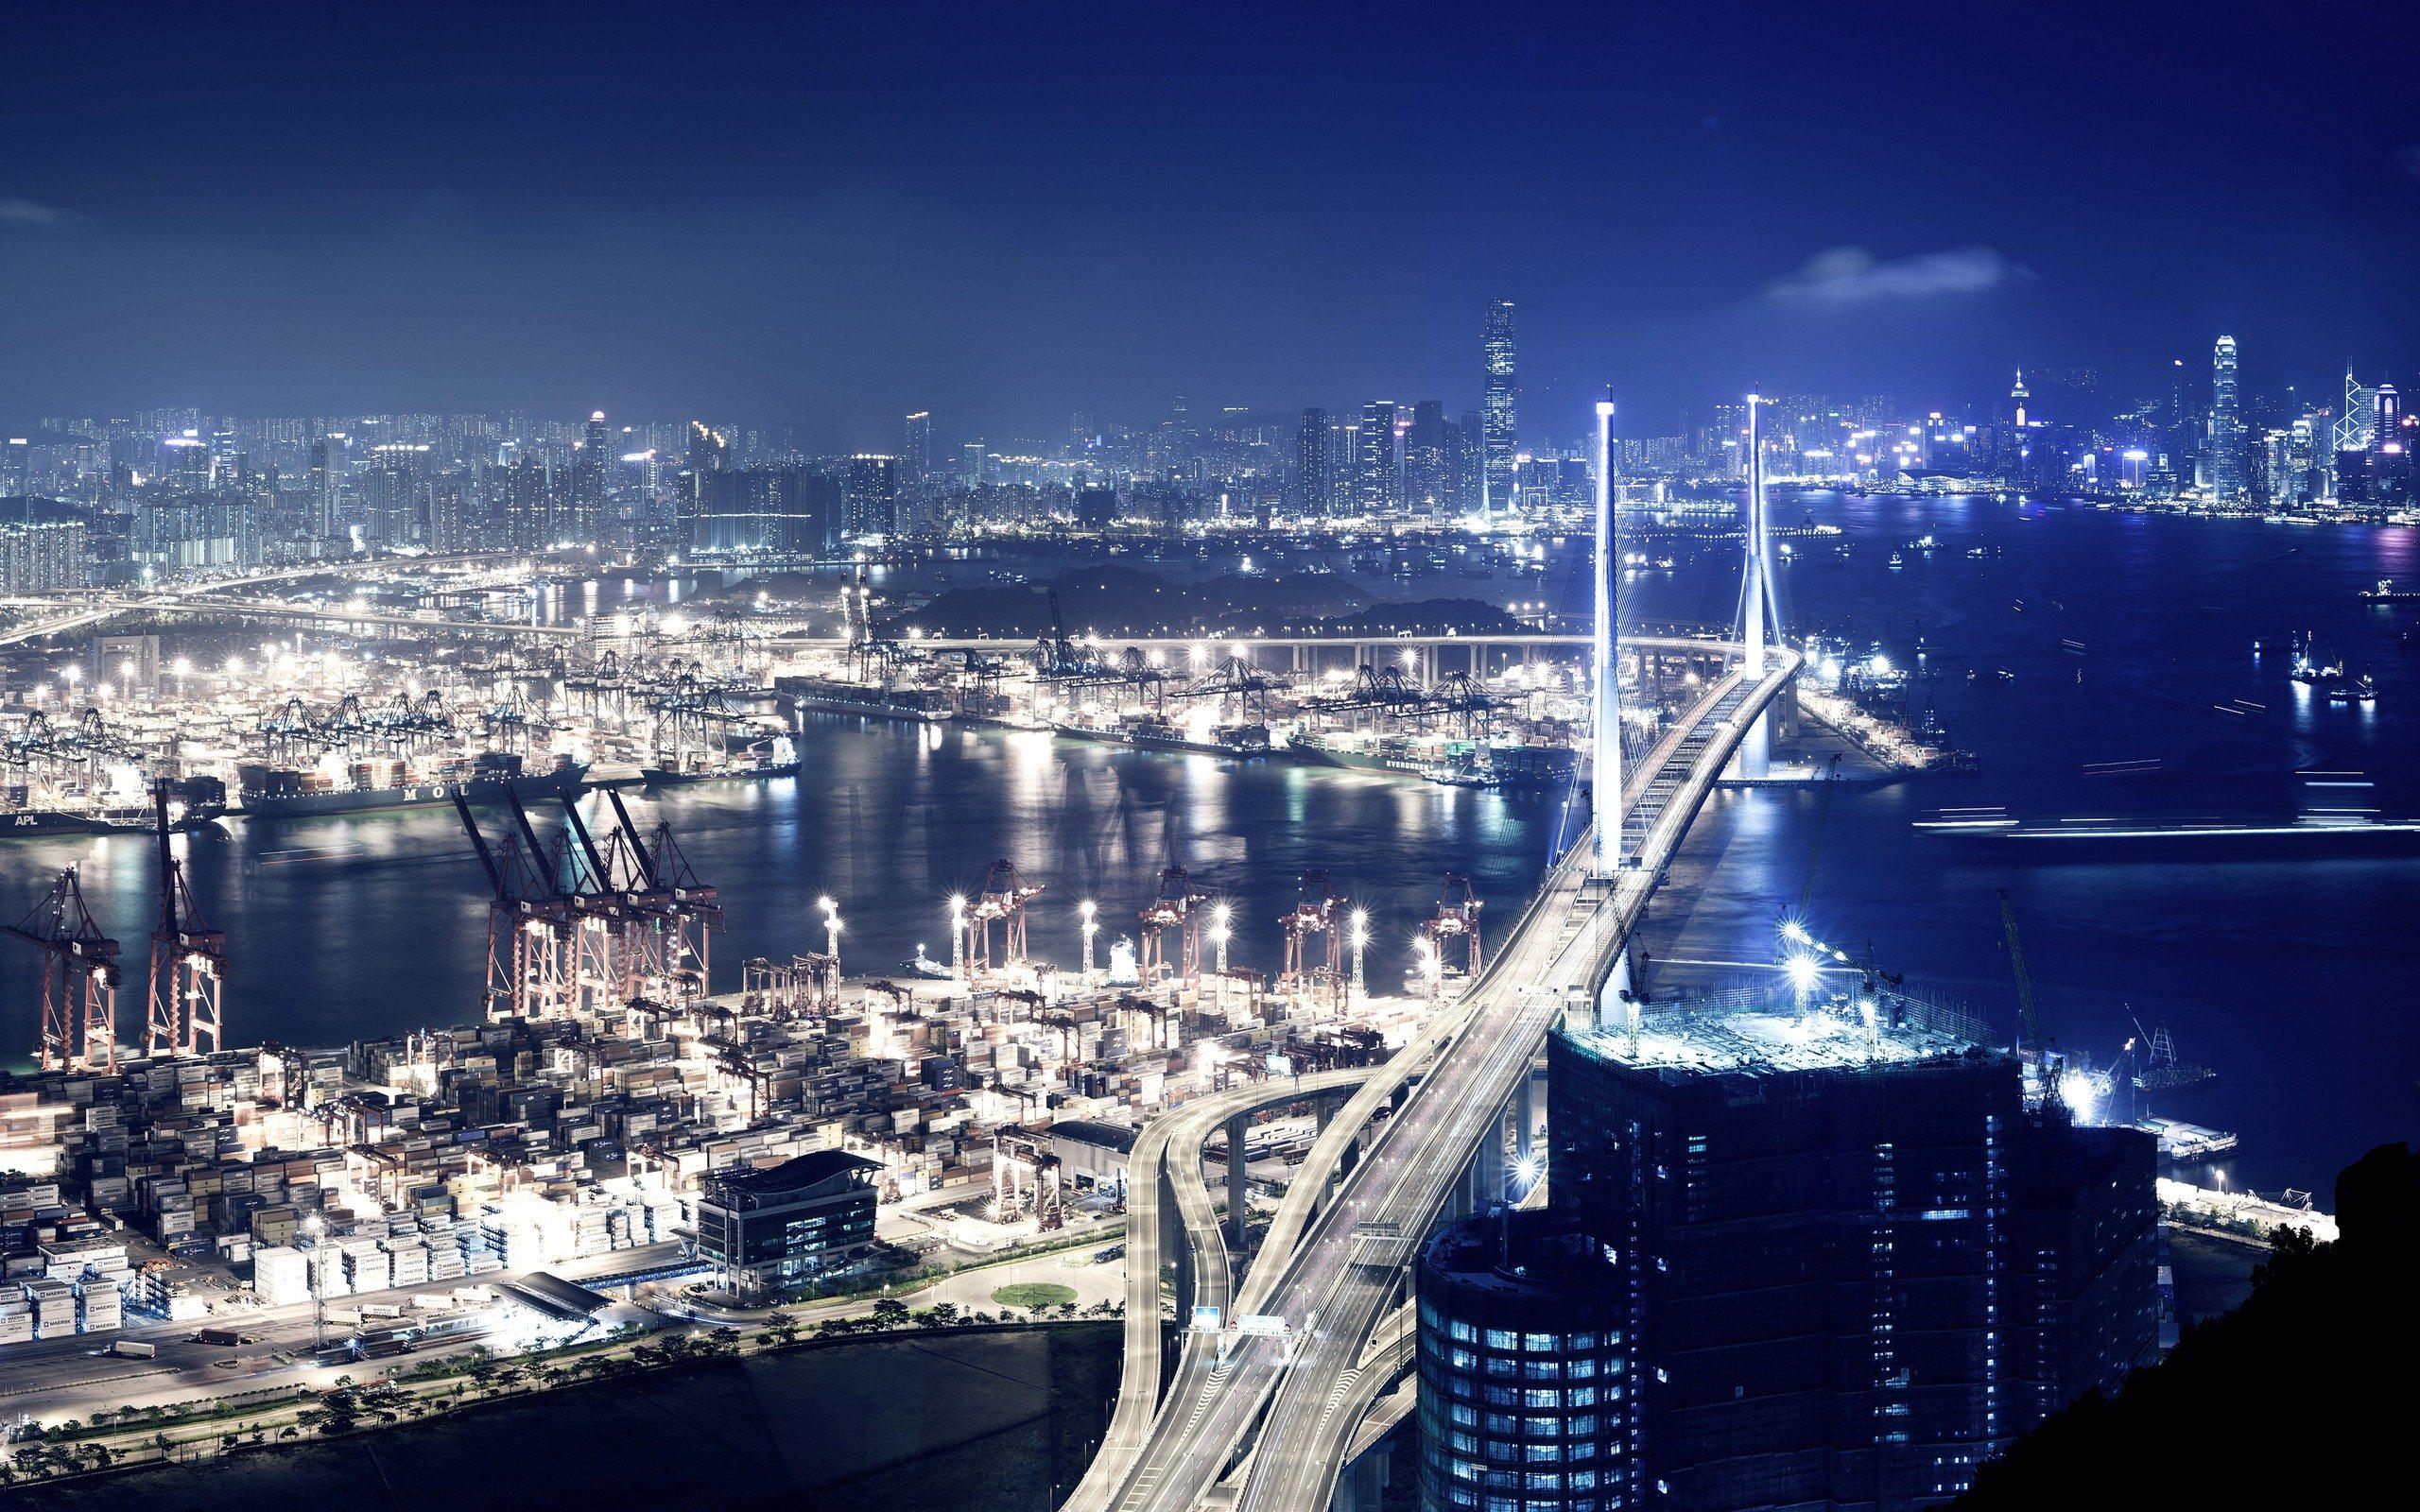 Cool City Panorama HD Wallpaper 2560x1600